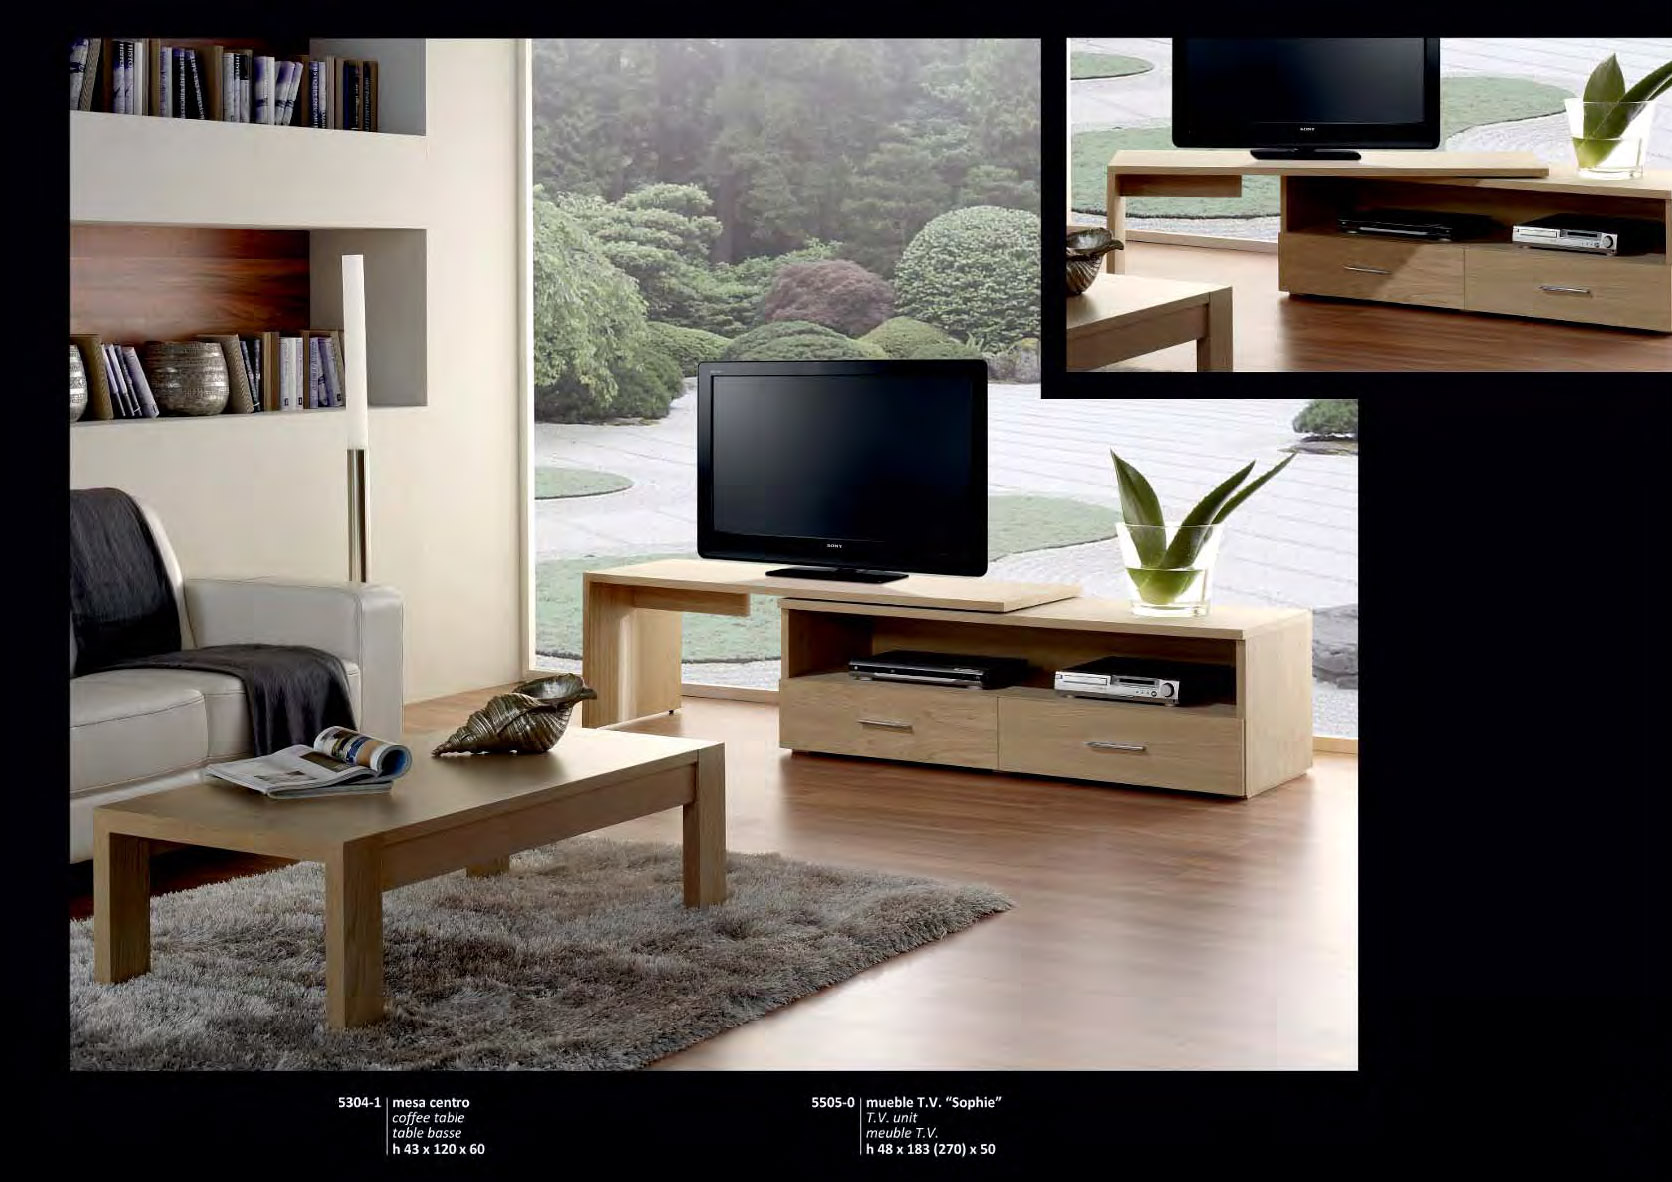 magasin de meuble dans le var maison design. Black Bedroom Furniture Sets. Home Design Ideas